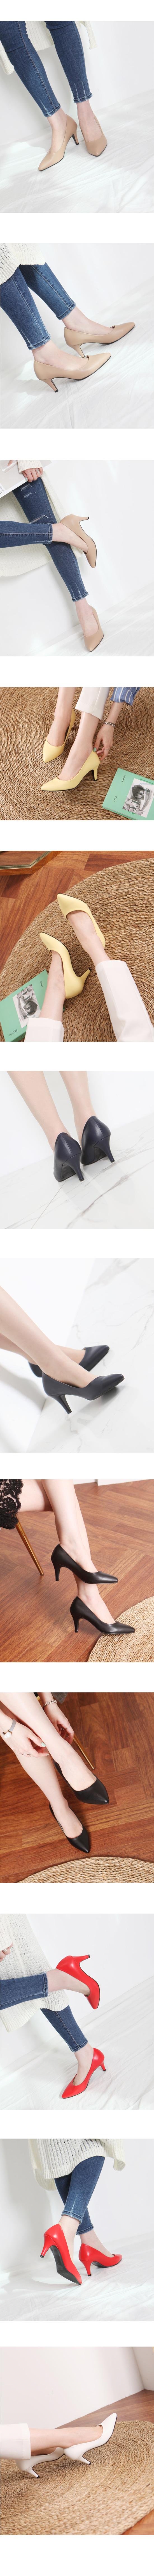 Stiletto high heel basic shoes 7cm light beige